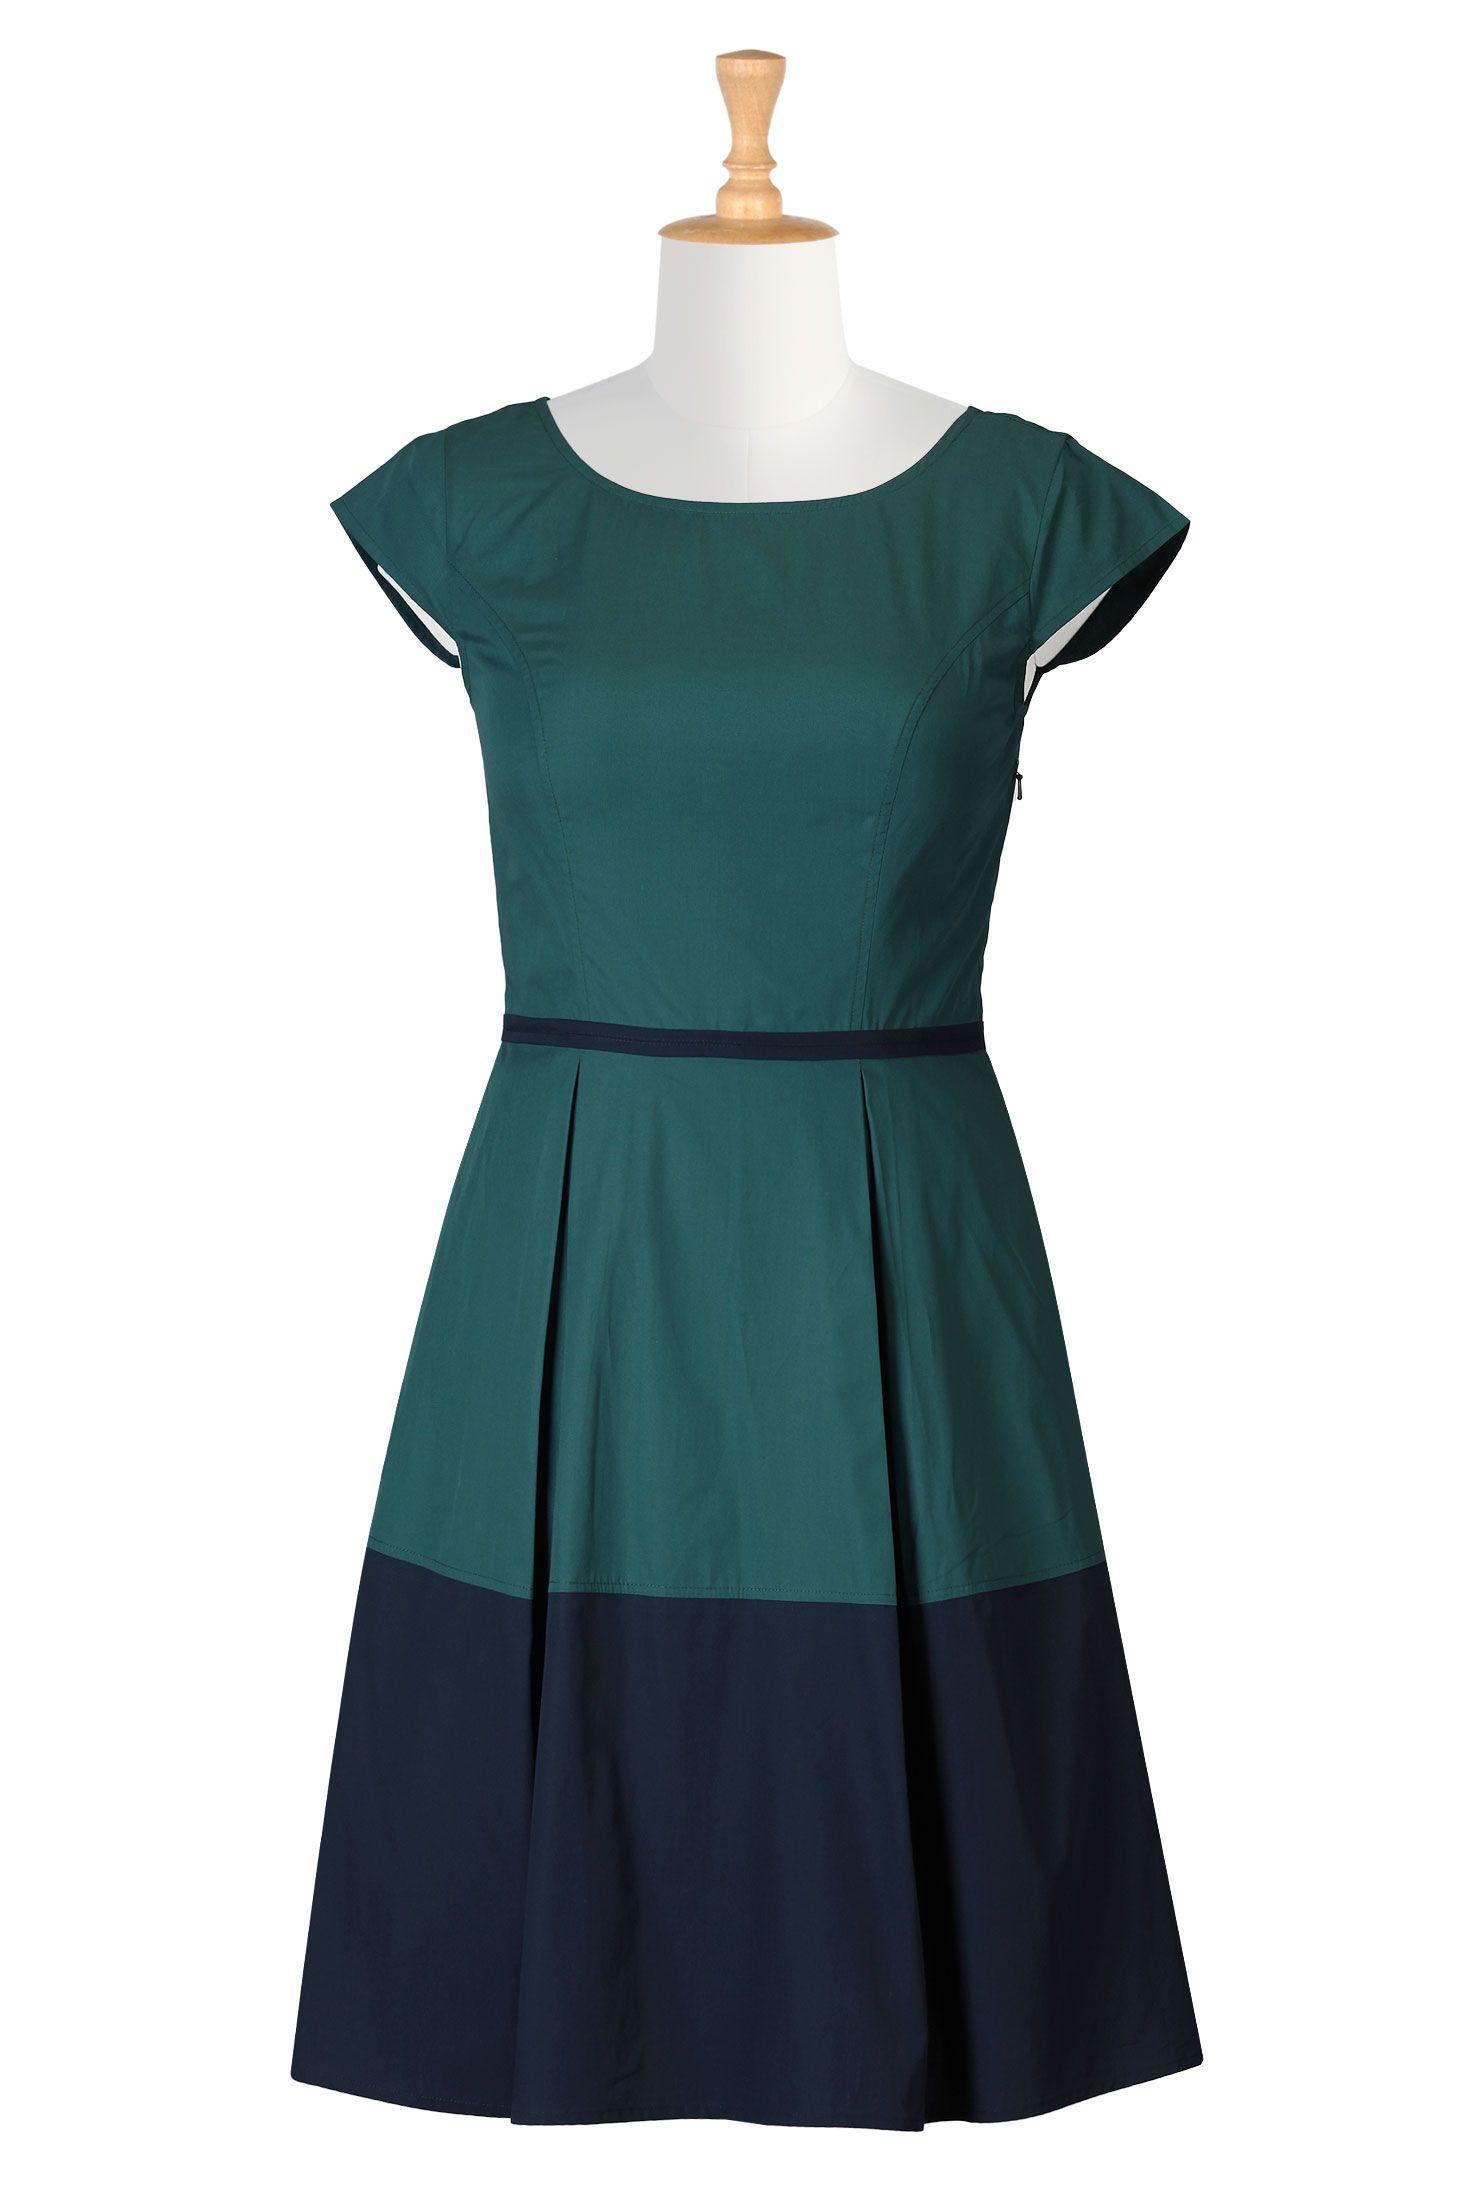 Retro two tone colorblock dress | Colorblock dress, Classy clothes ...